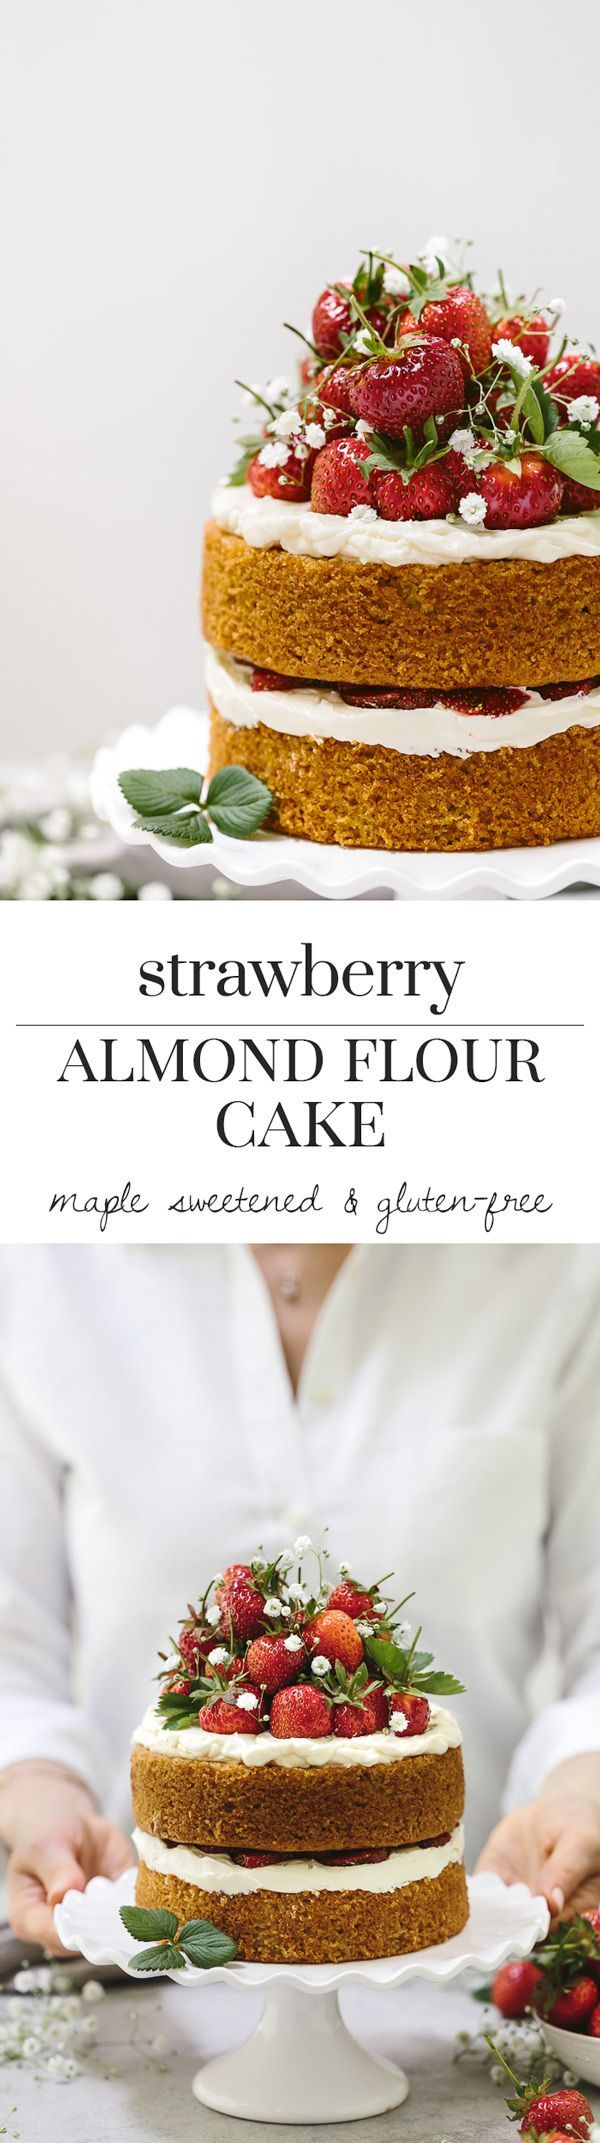 Strawberry Almond Flour Cake Recipe: Celebrate strawberry season with this gluten-free and maple-sweetened strawberry almond flour cake that is flavored with mascarpone whipped cream.